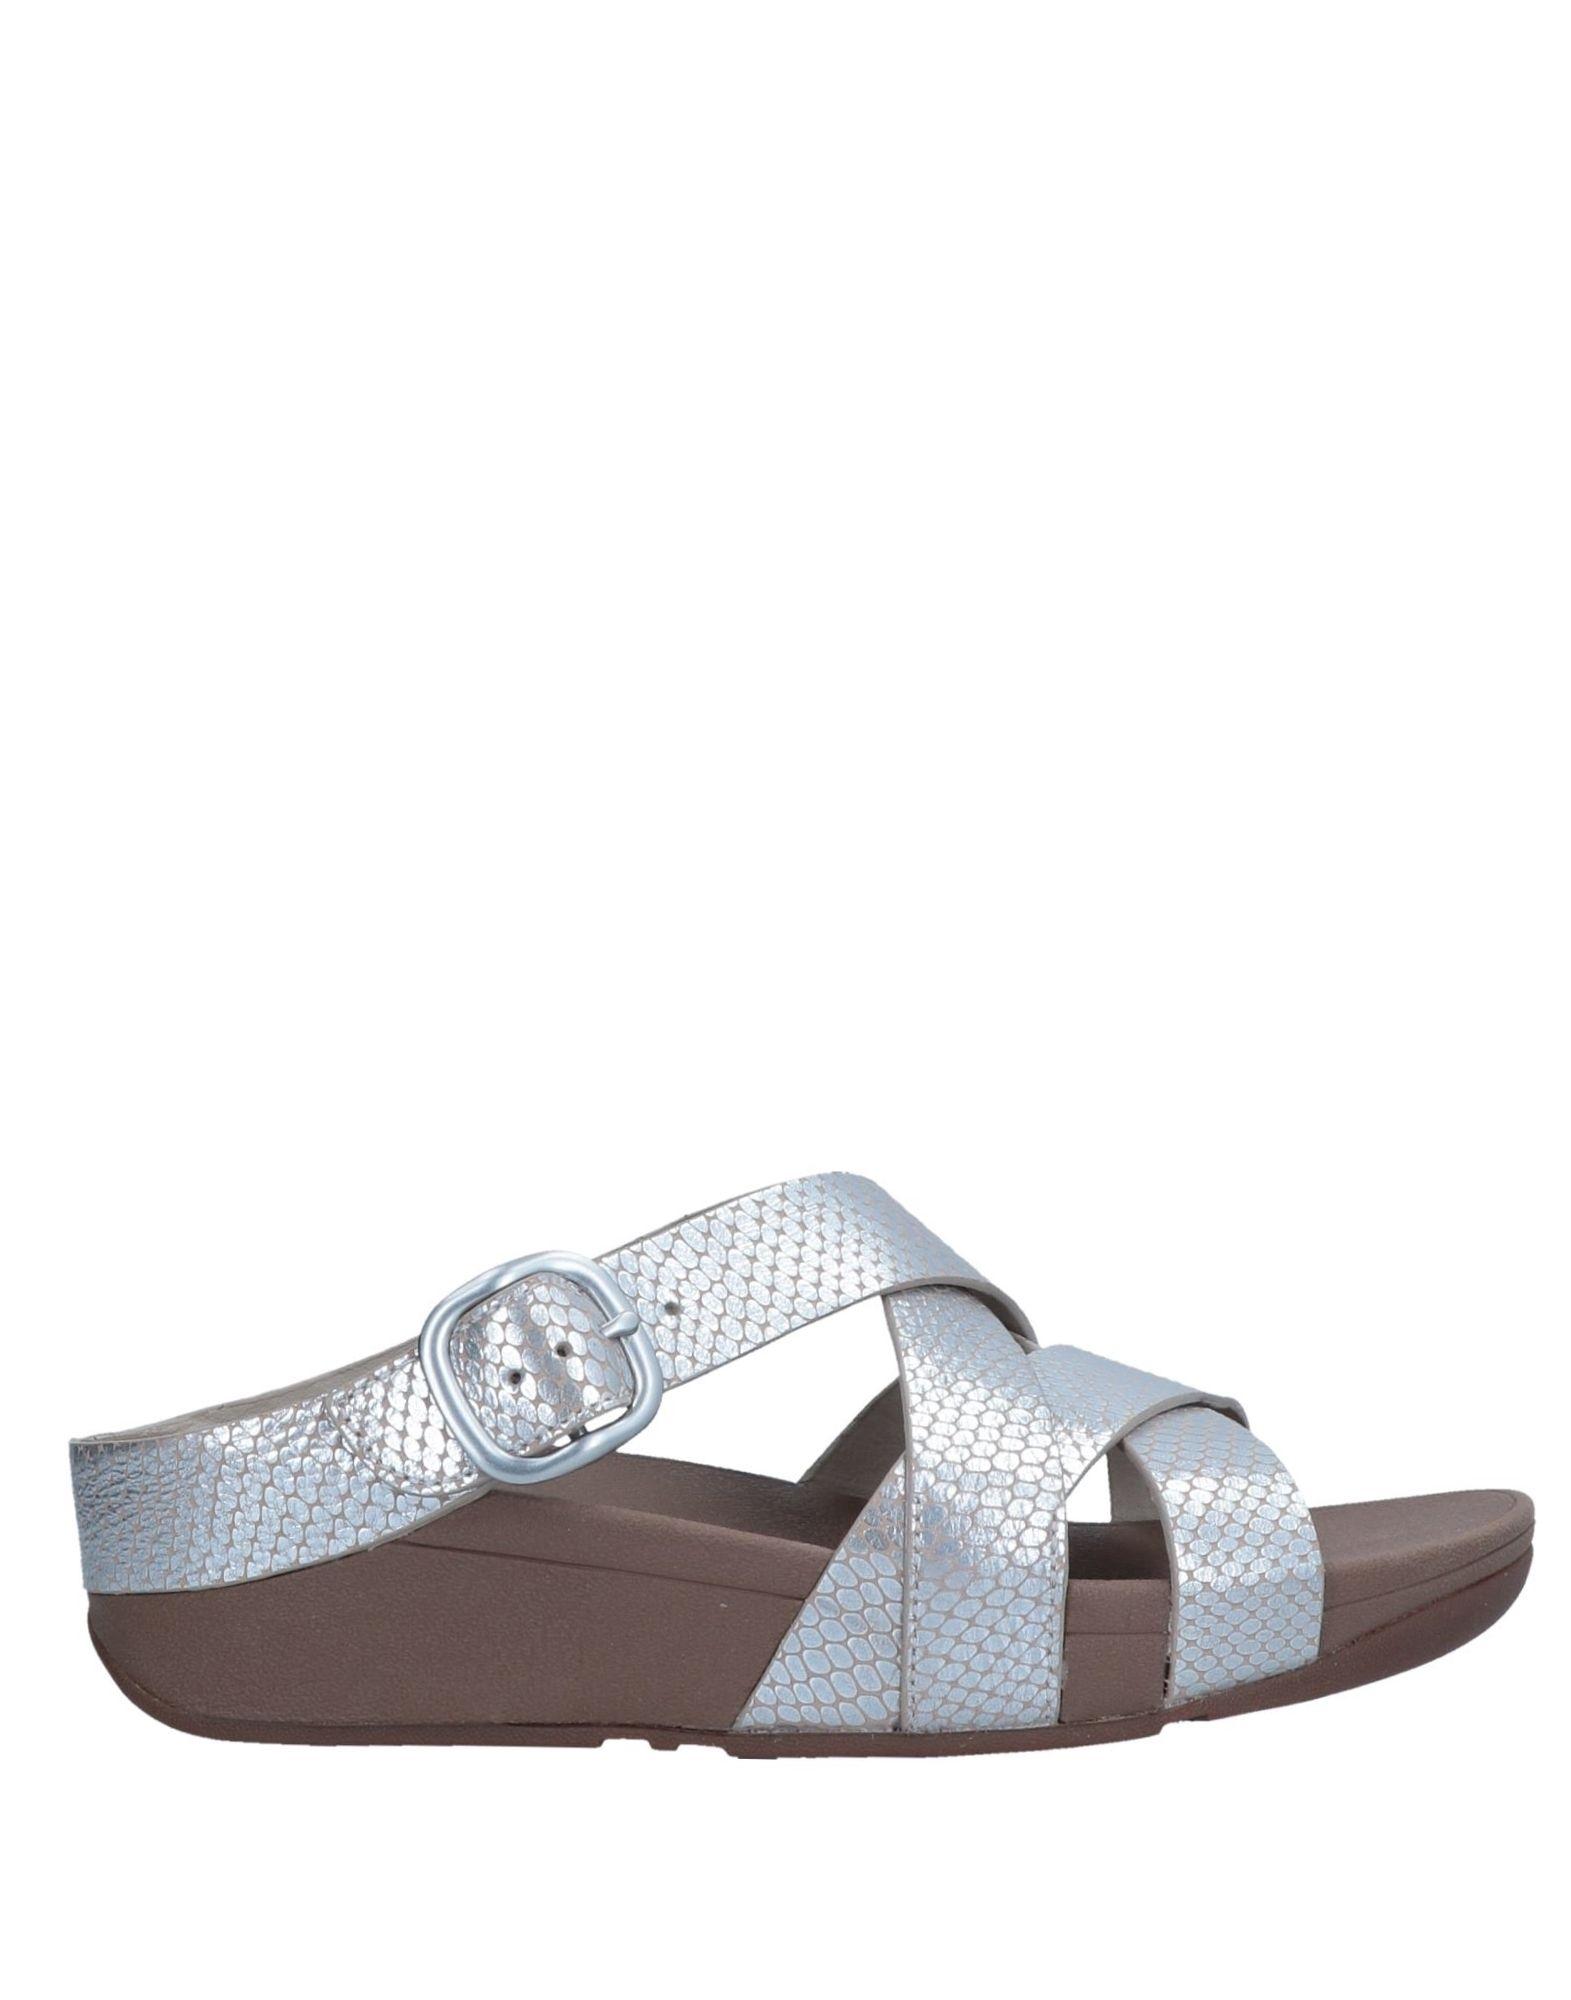 Sandali Scarpe Fitflop Donna - 11549282XG Scarpe Sandali comode e distintive c68997